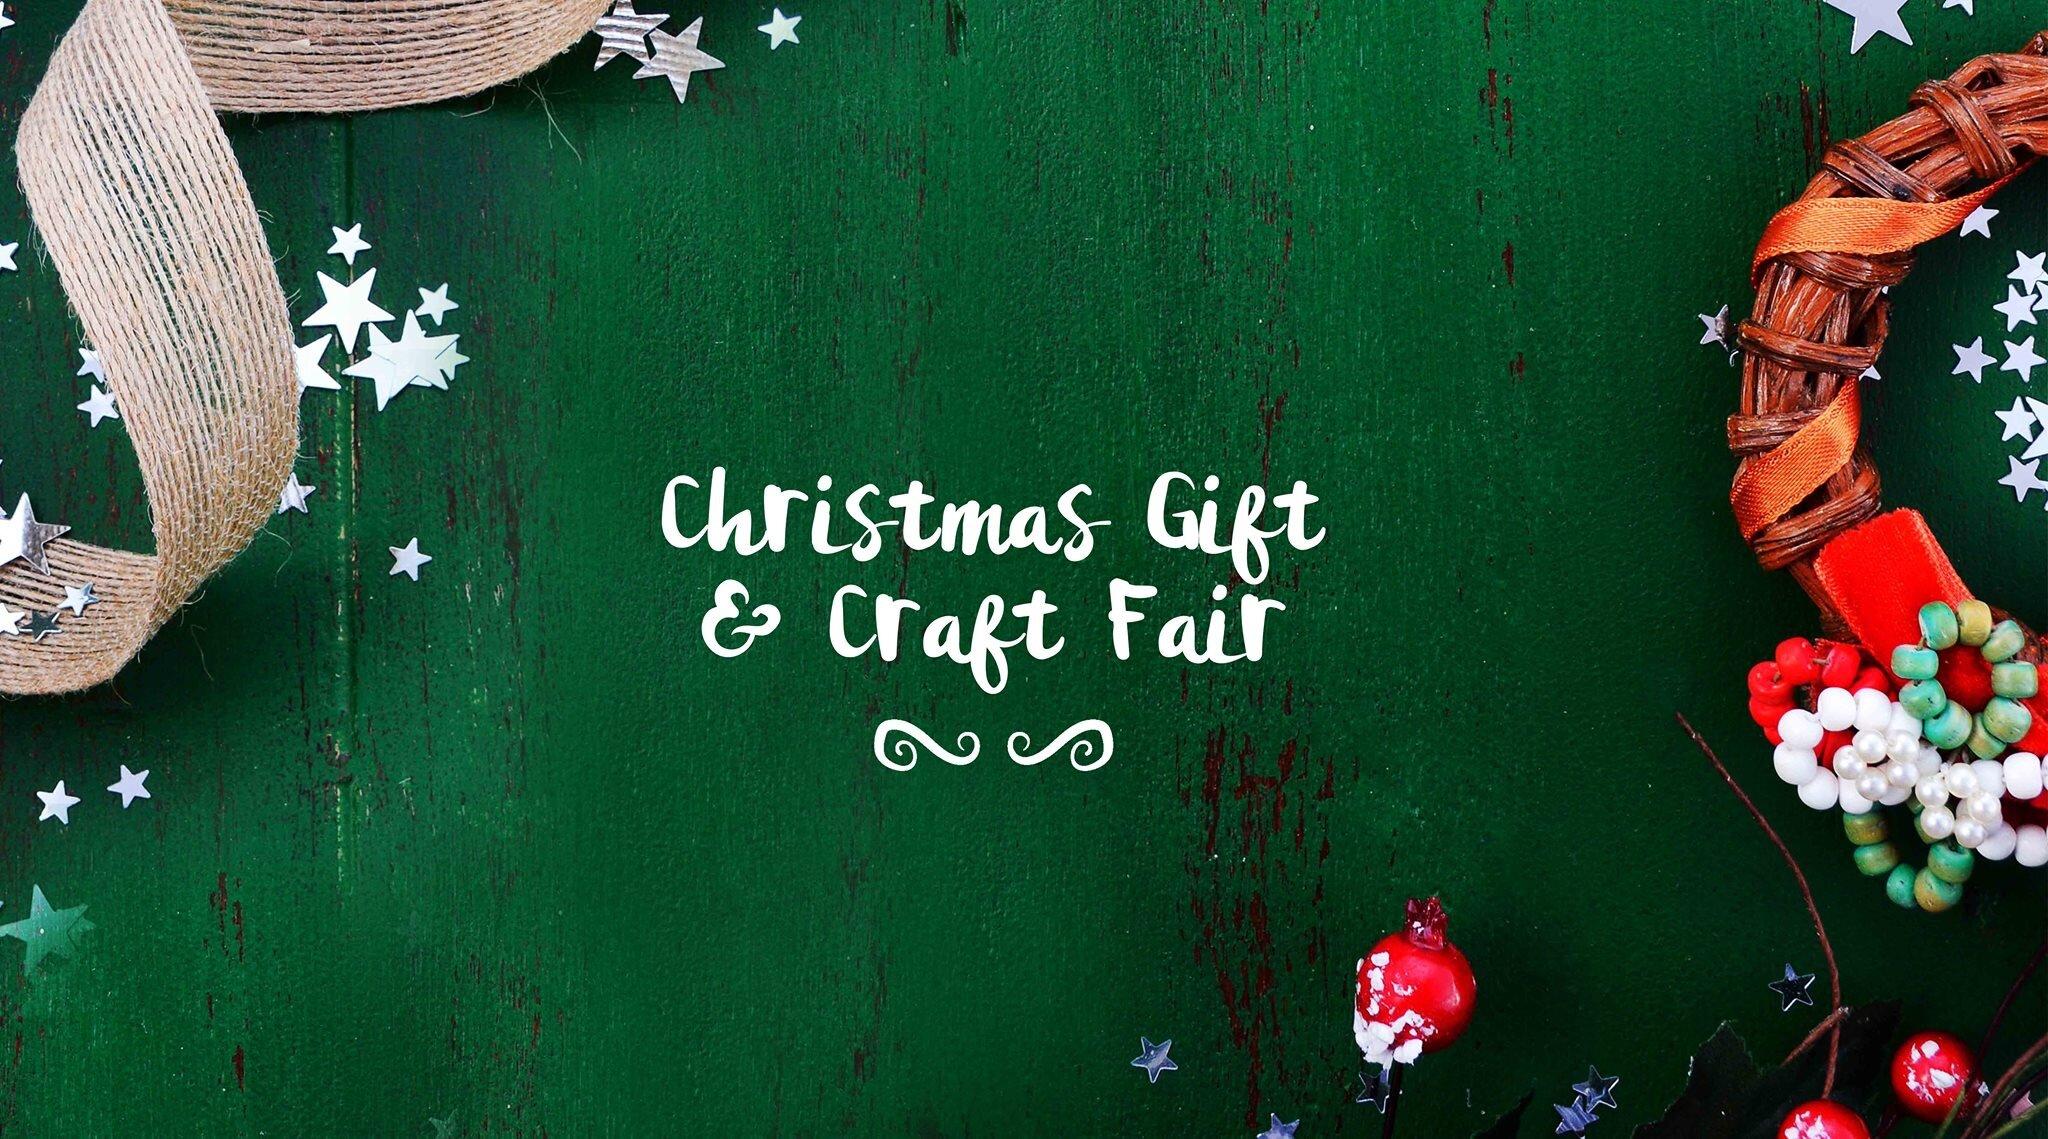 WSV - Christmas Gift and Craft Fair.JPG